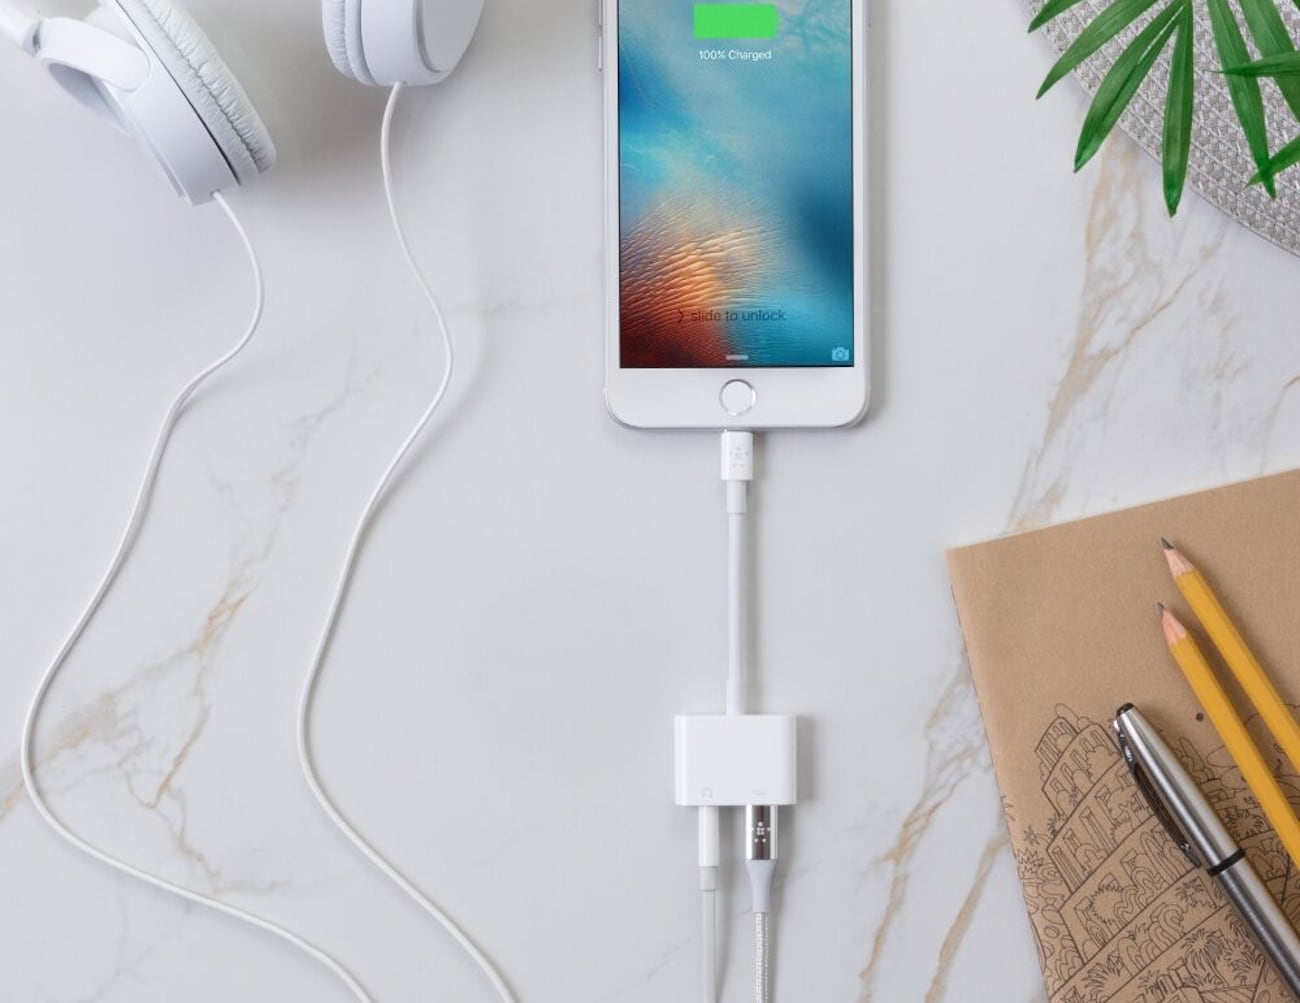 Belkin RockStar Lightning Audio + Charge Device